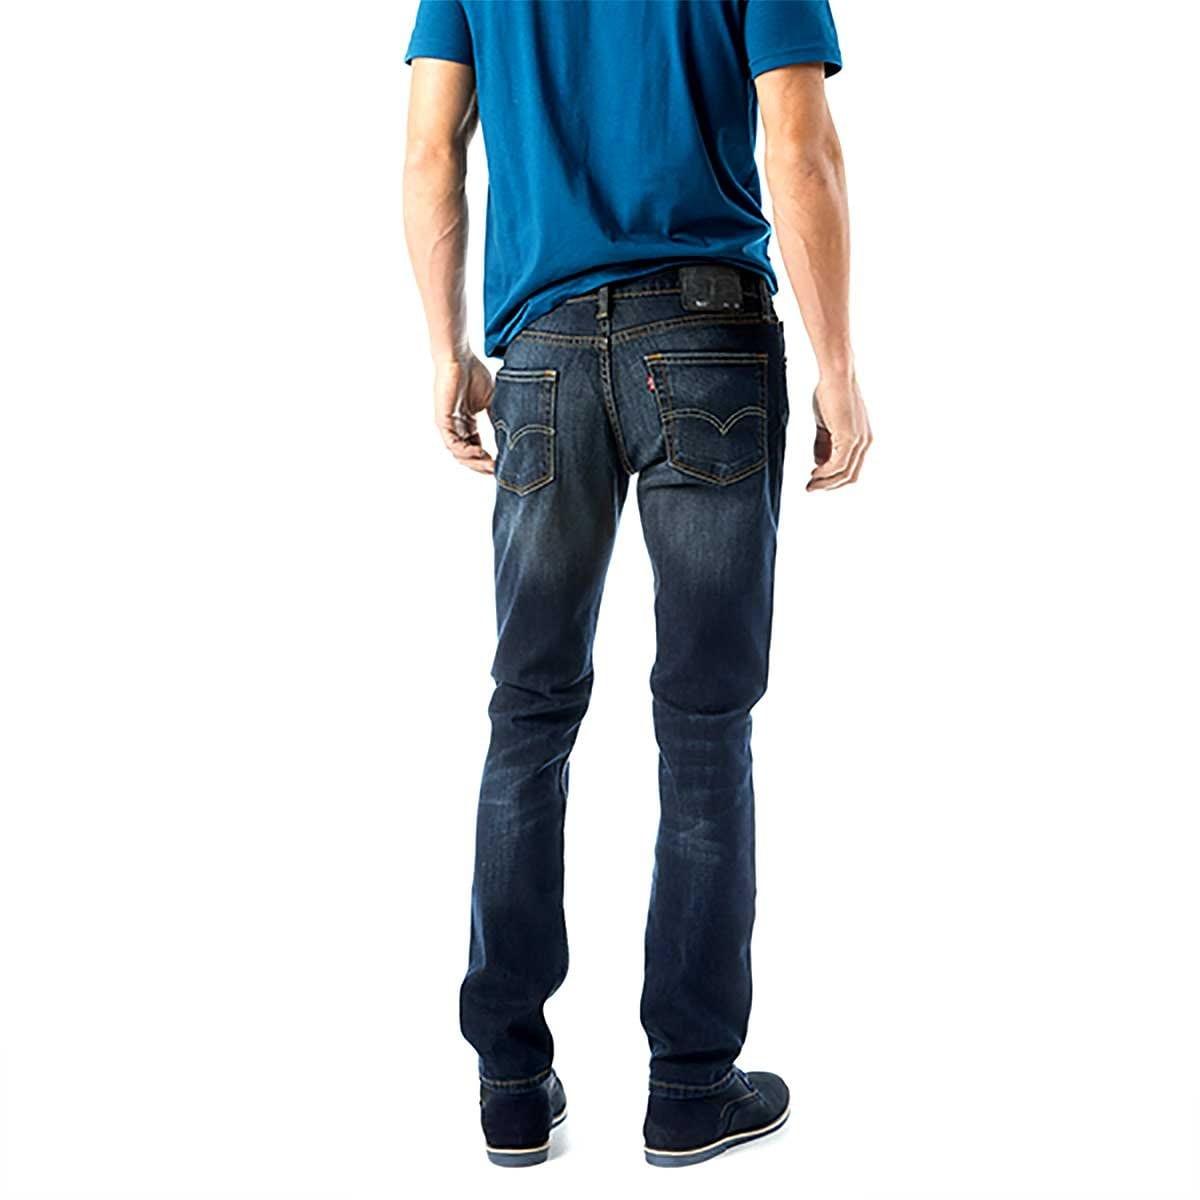 Jeans 511 Slim Fit Levi's